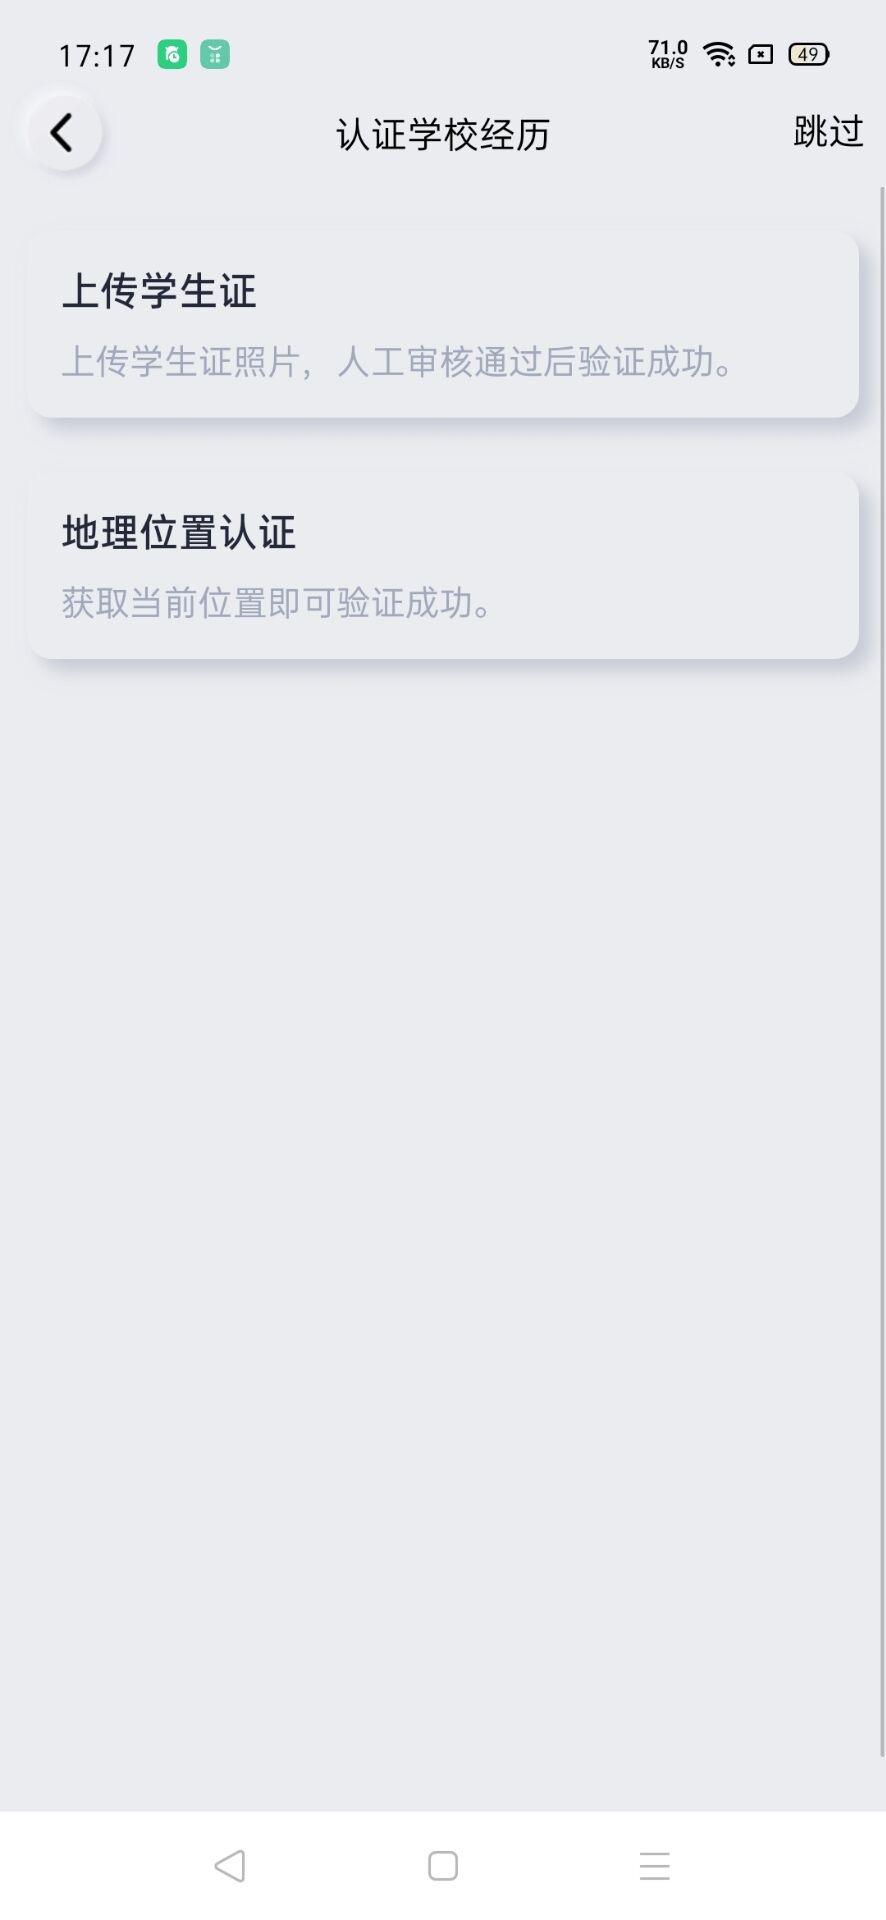 QQ校园认证,QQ校园秒过认证